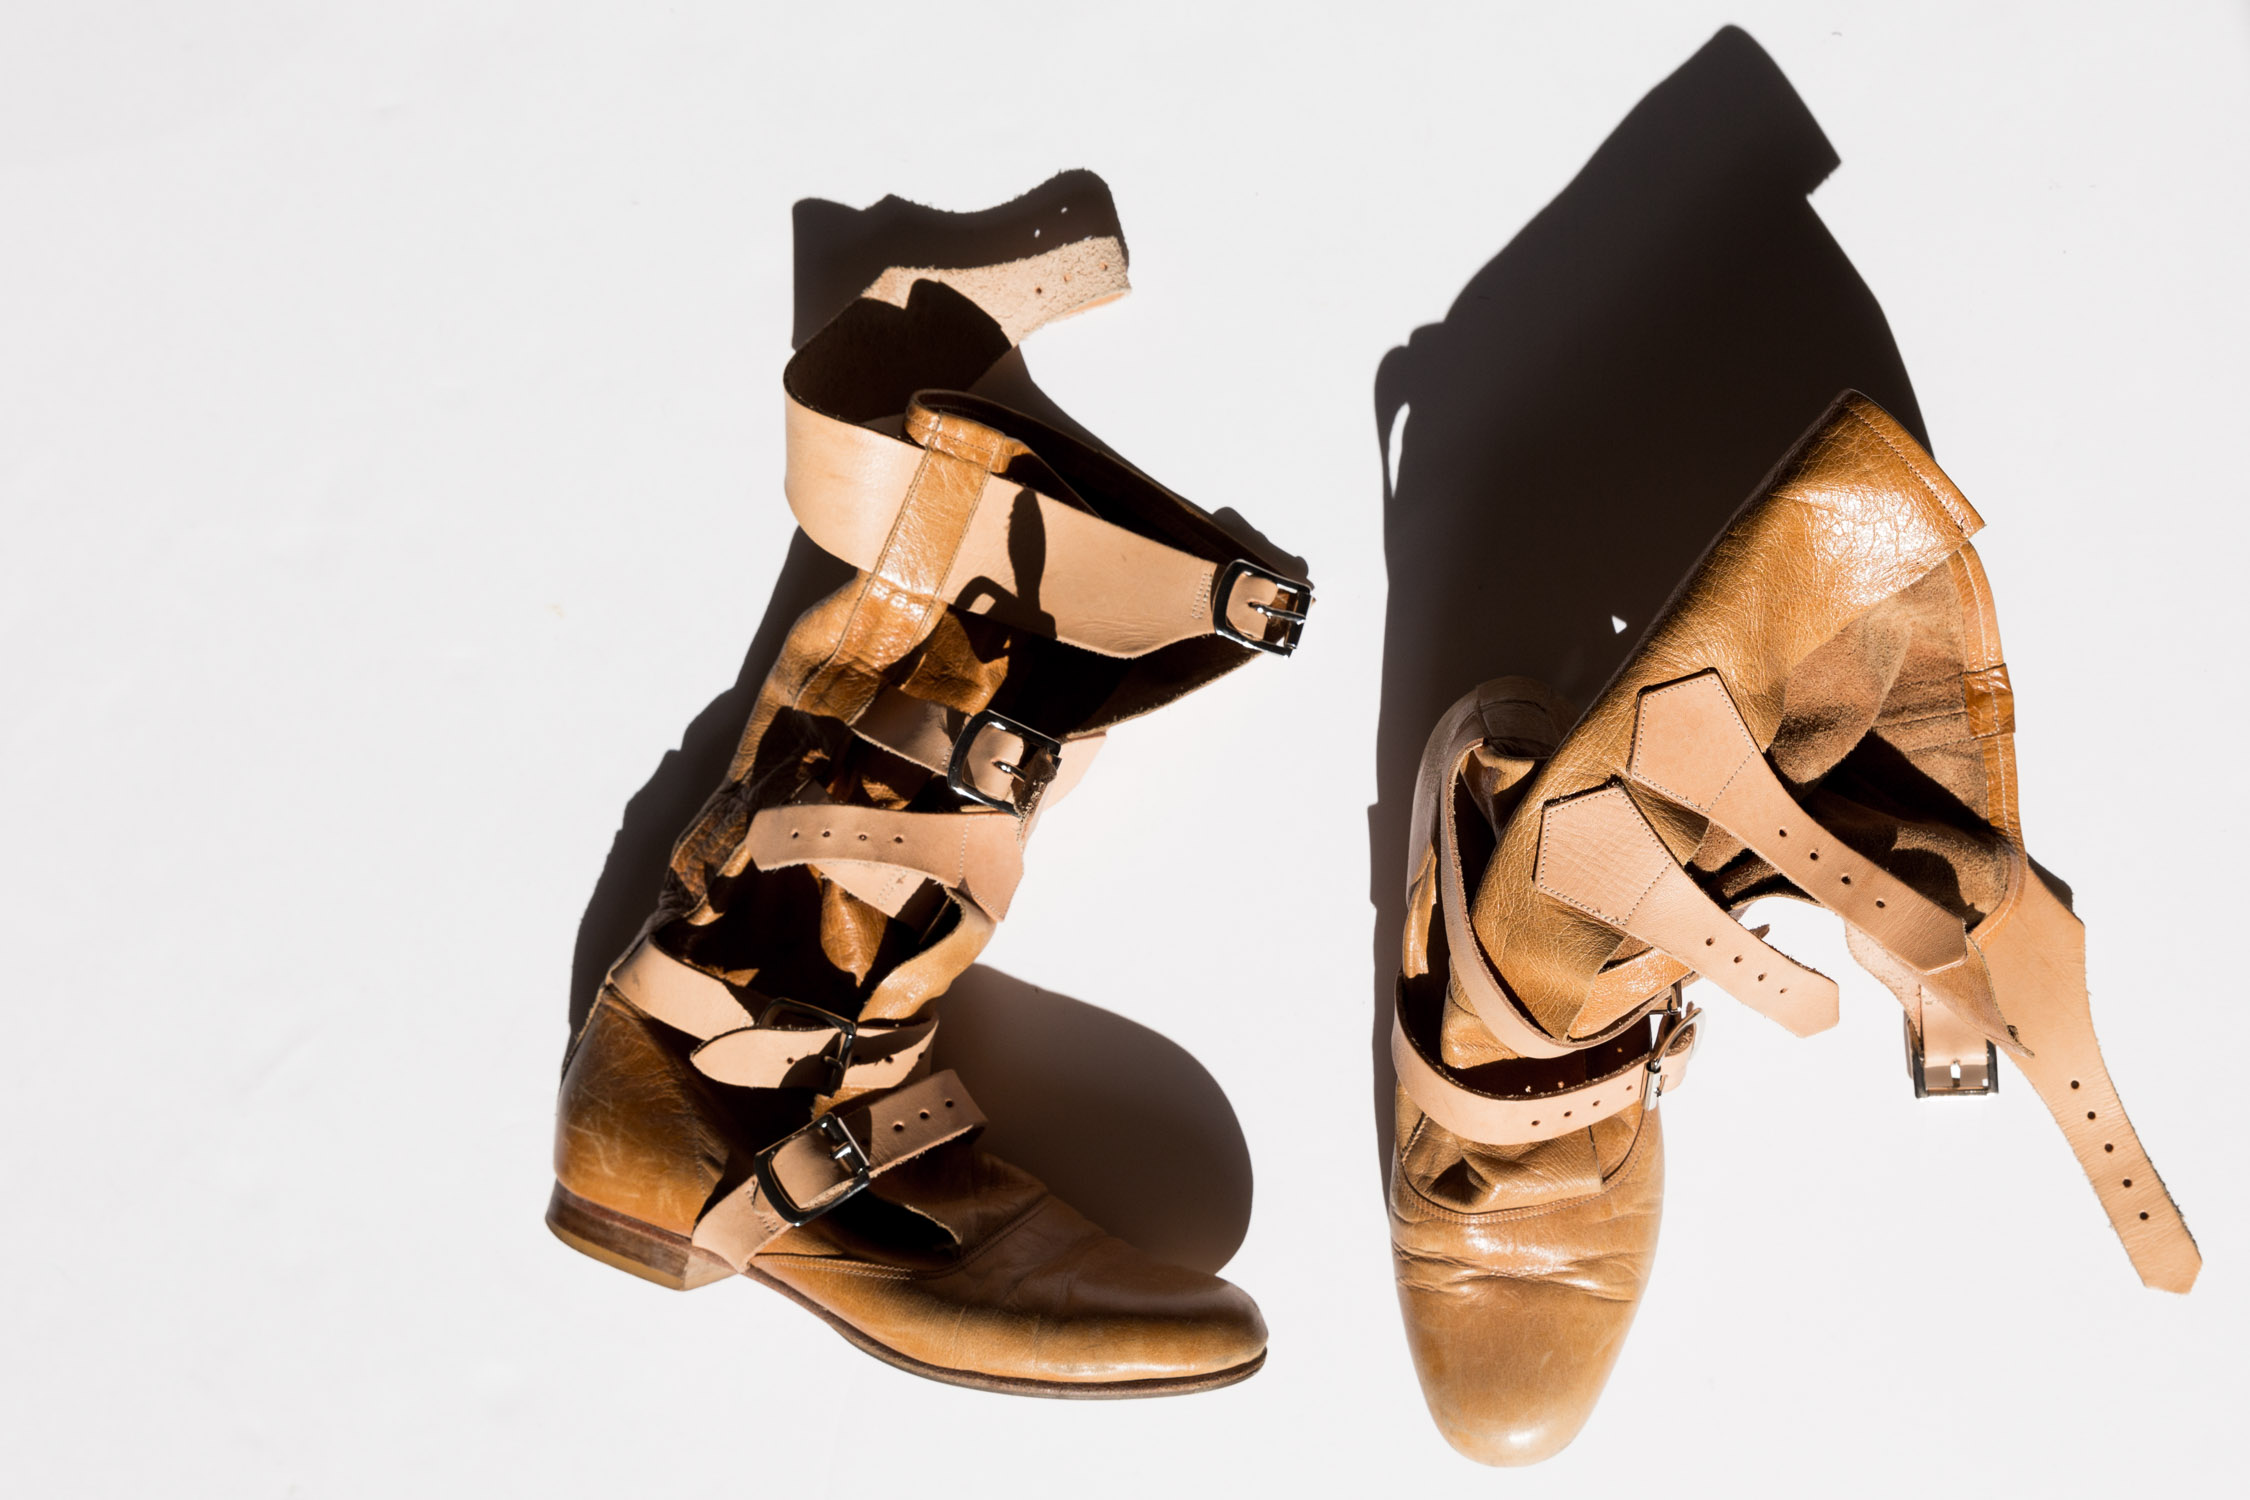 pirat-boots-vivienne-westwood